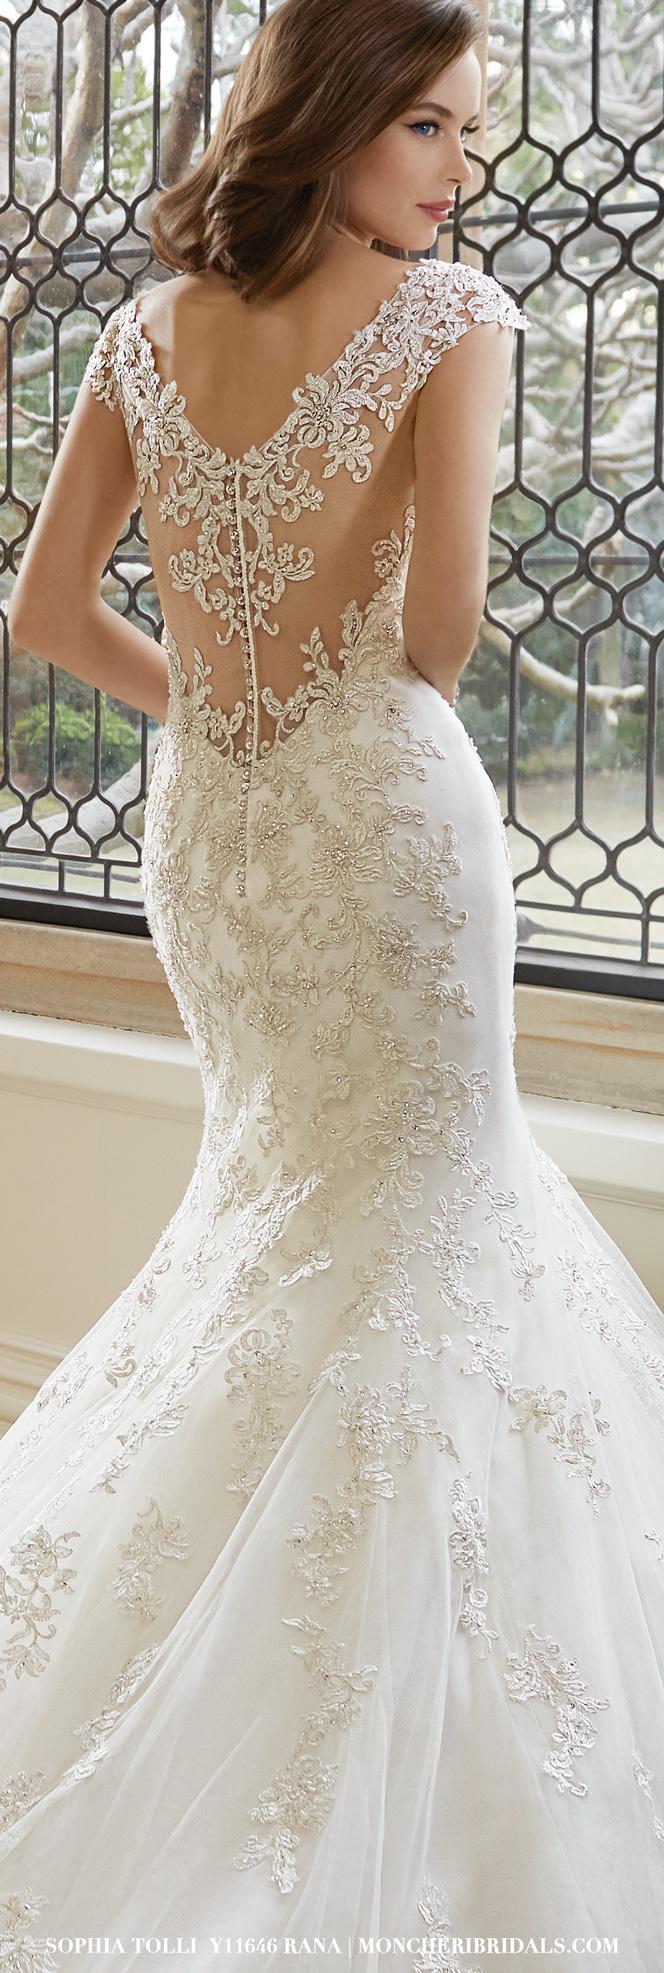 Back detail wedding dress  Y u Rana  Pinterest  Wedding dress Weddings and Wedding